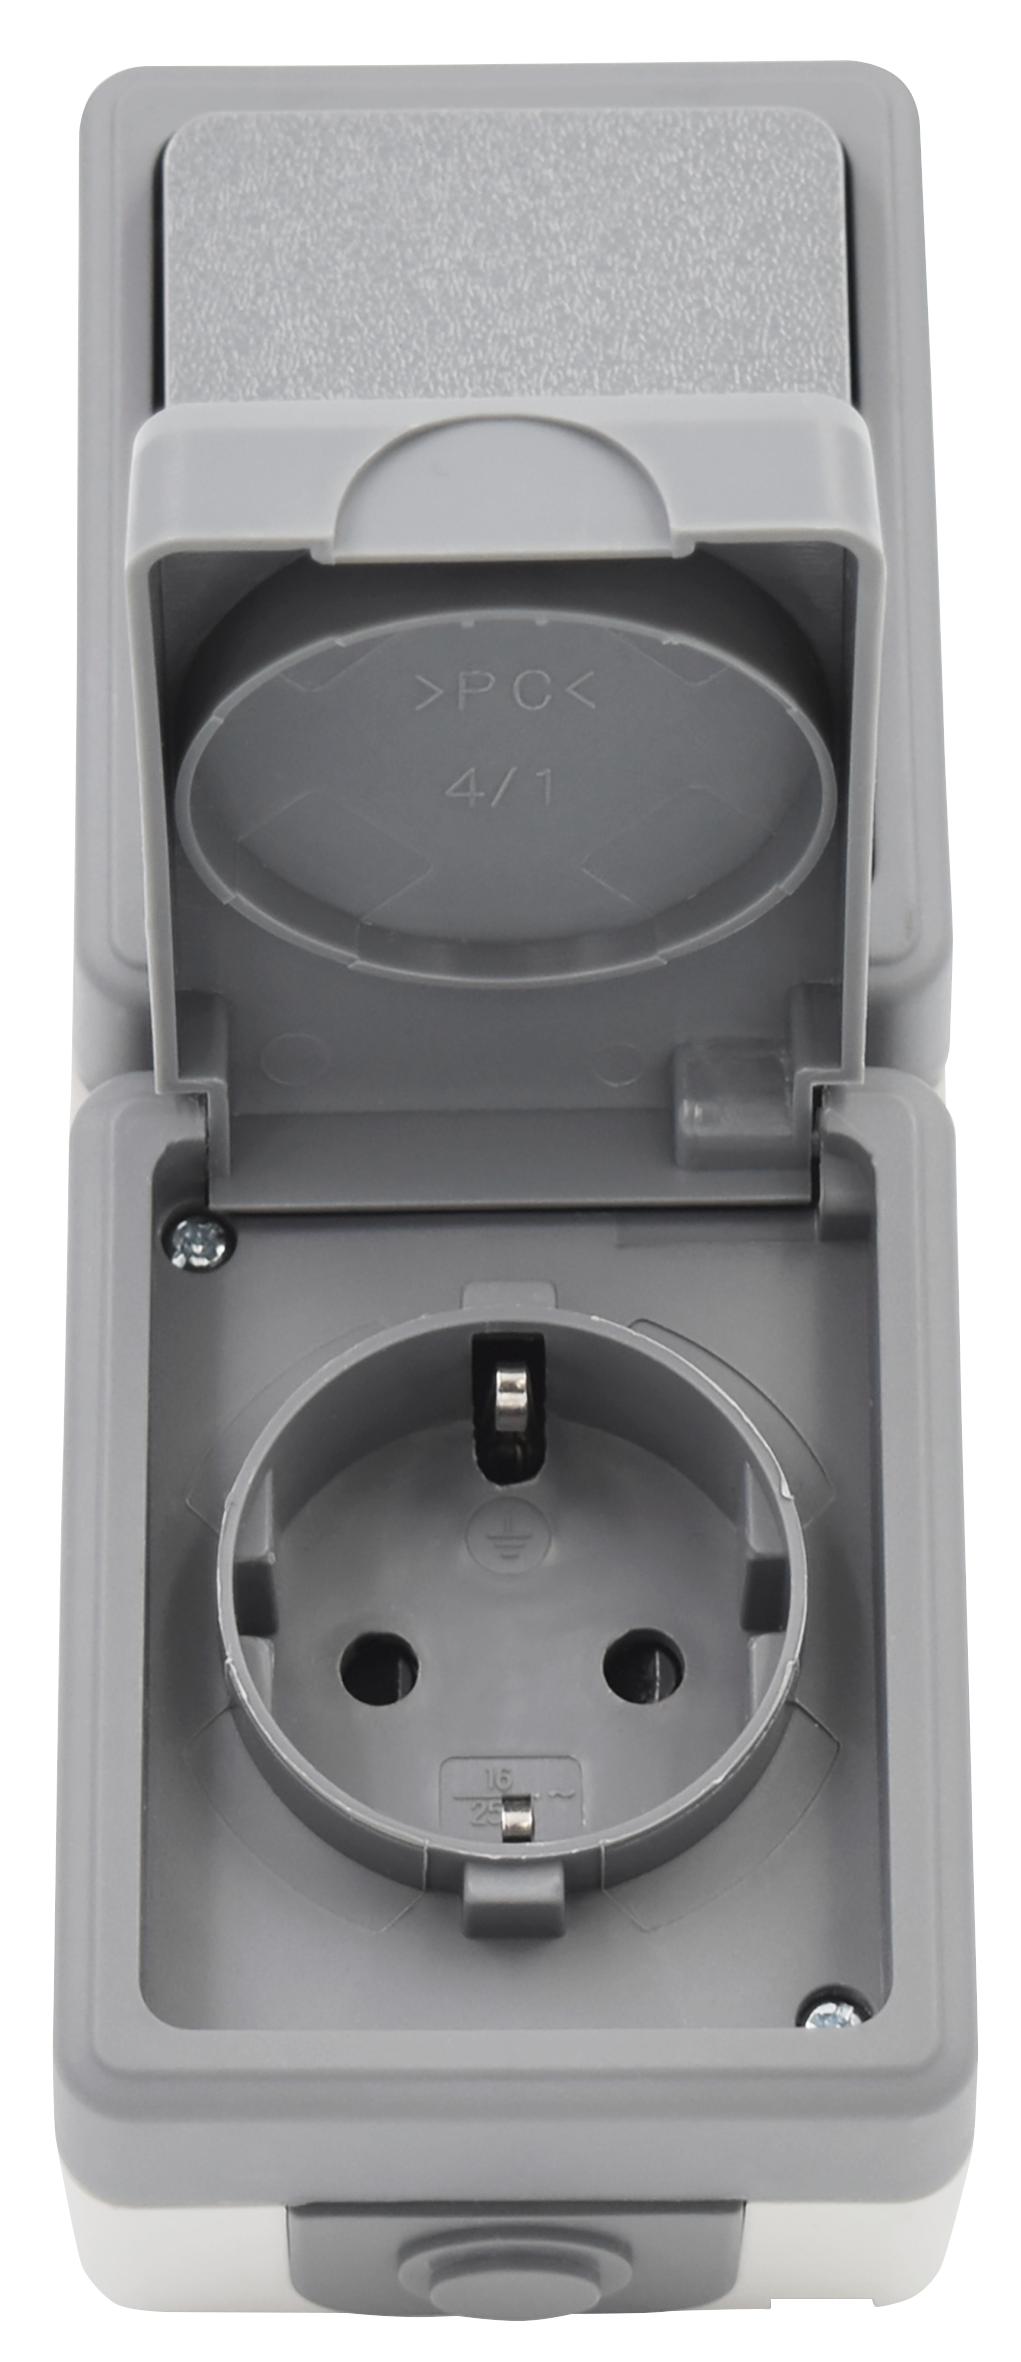 Feuchtraum Kombi-Dose McPower ''Secure'' 250V~, Schalter+Steckdose, IP44, AP, grau